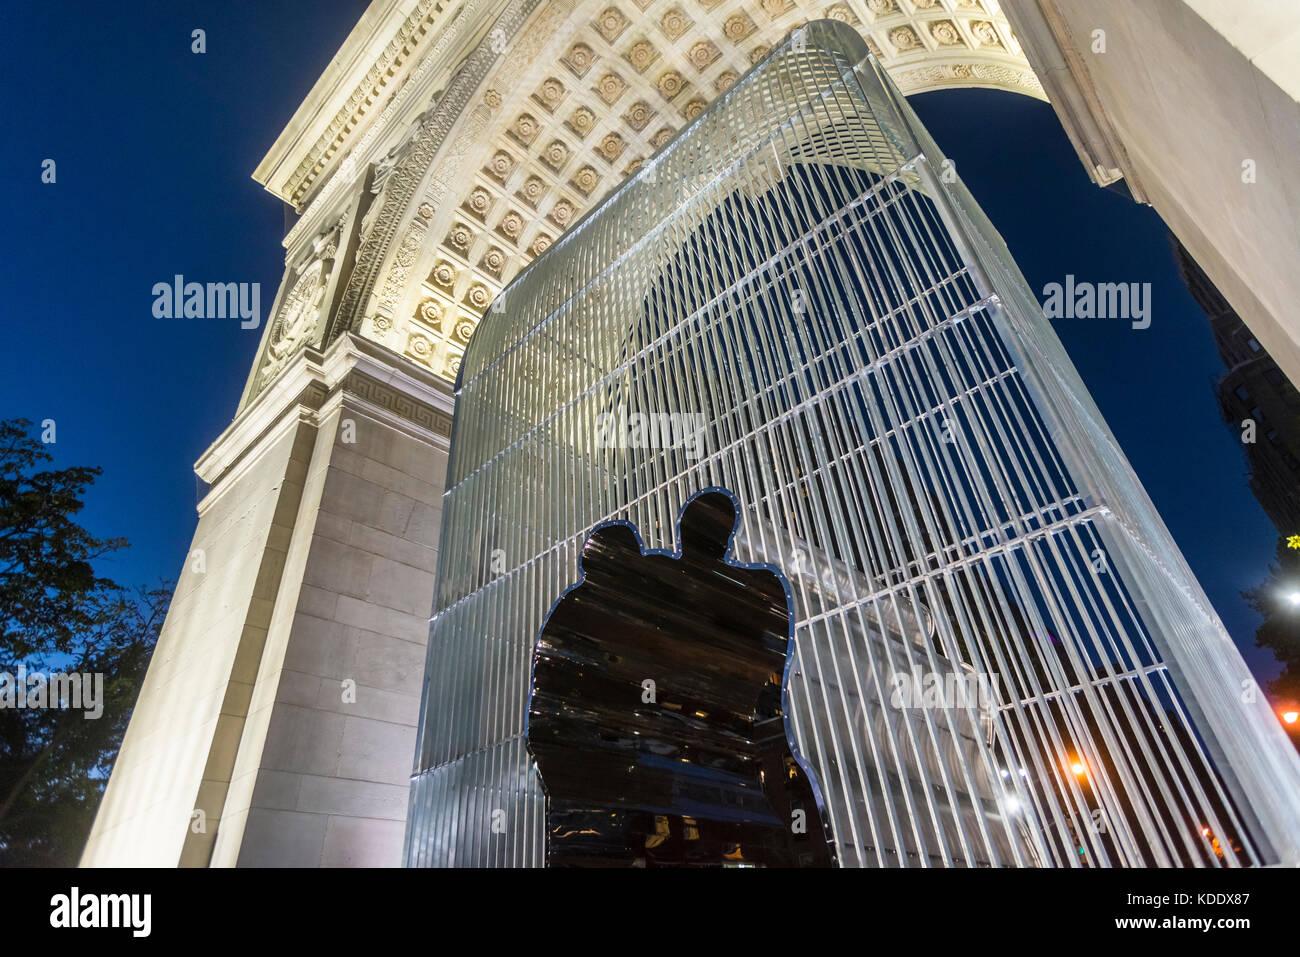 New York, USA. 12 Oct, 2017 Ai Weiwei's sculptural installation 'Good Fences Make Good Neighbors' officially - Stock Image